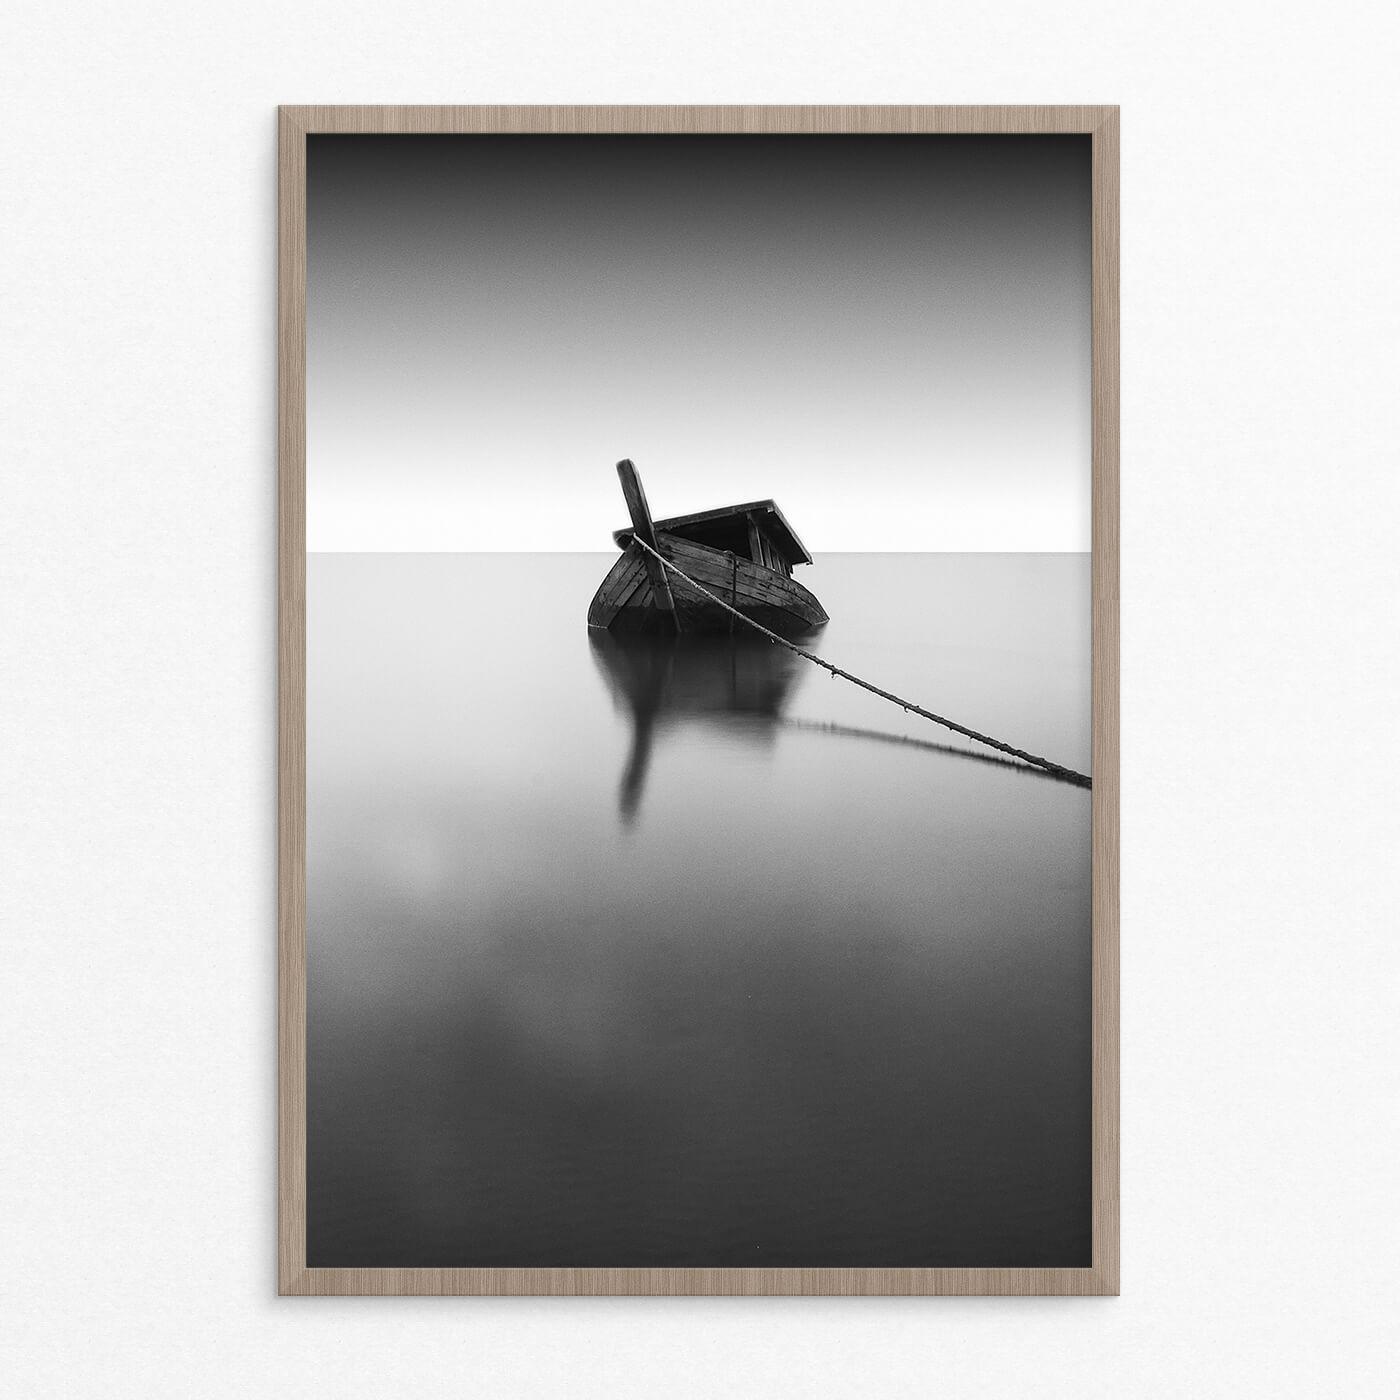 Plakat, bro, skib